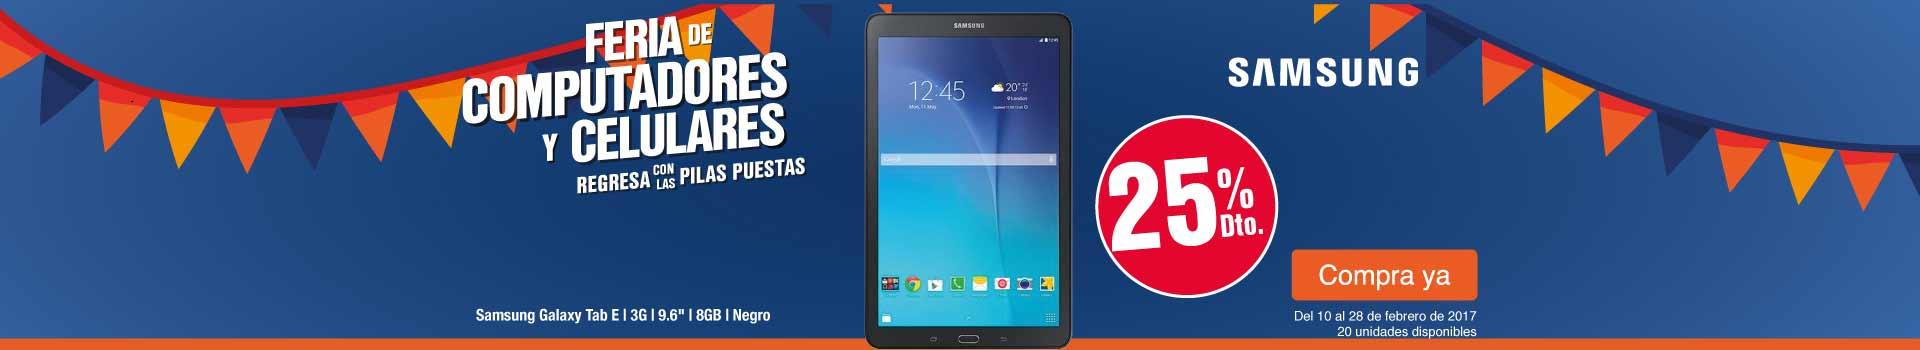 CAT AK - Samsung Galaxy Tab E | 3G | 9.6